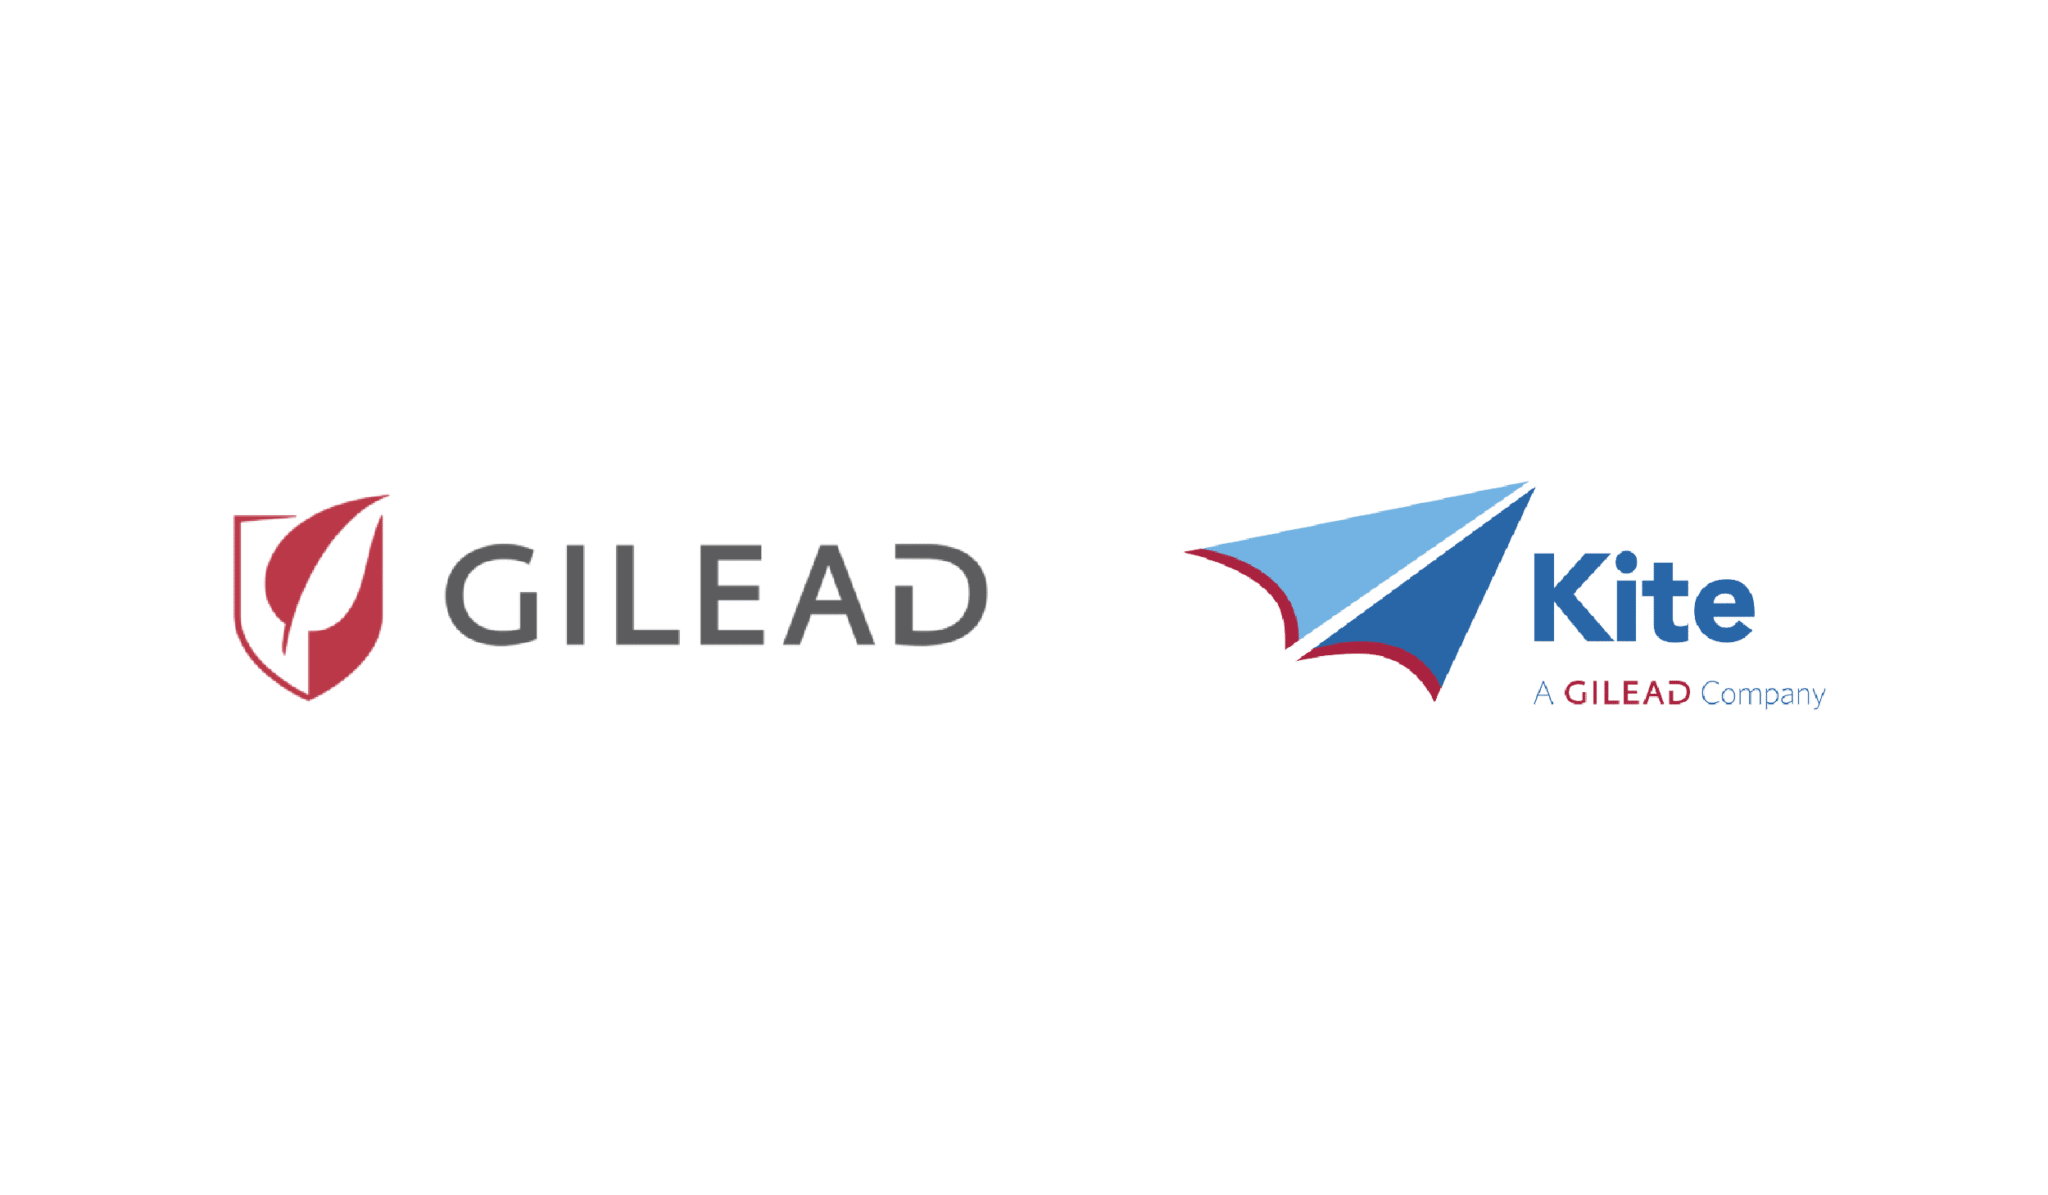 gilead kite1